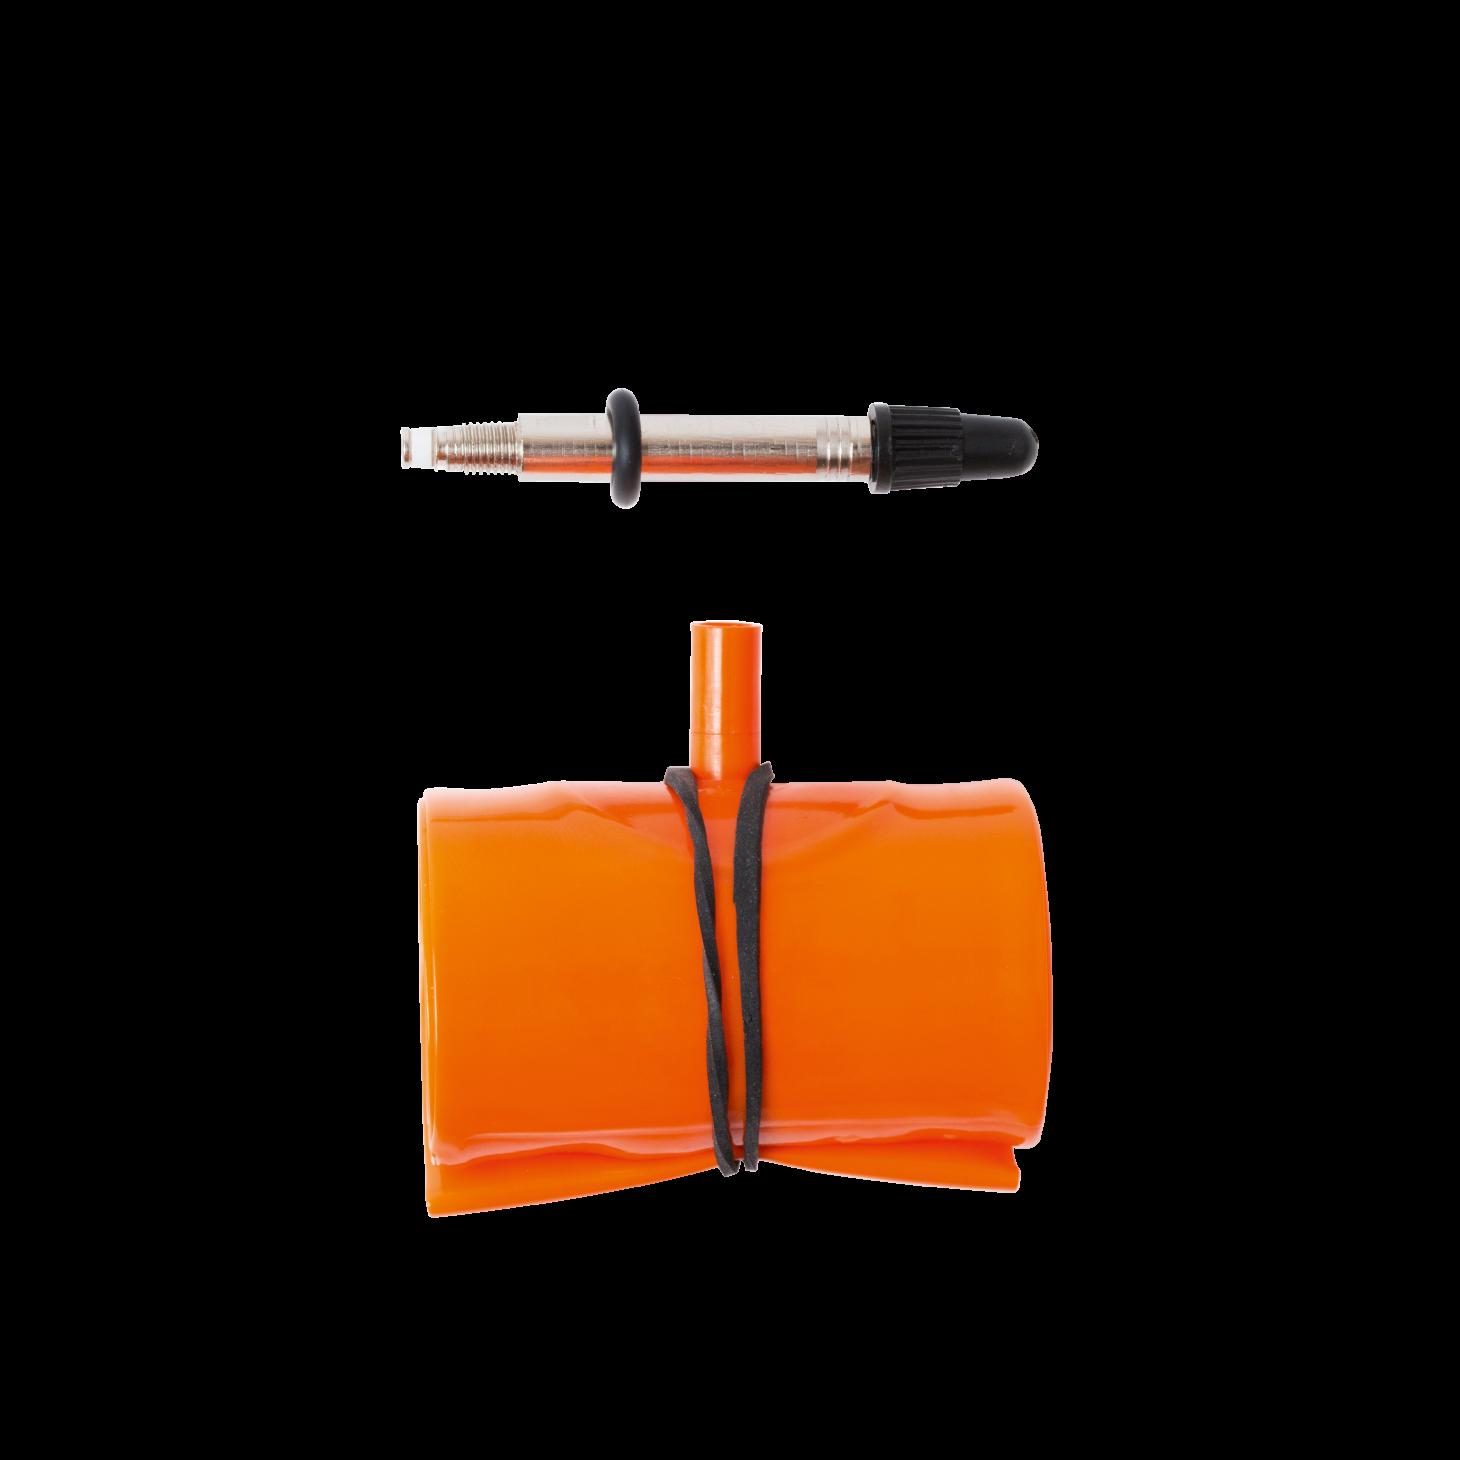 tubolito s tubo mtb 29 zoll ultralight schlauch sv 42 mm online kaufen bmo bike mailorder. Black Bedroom Furniture Sets. Home Design Ideas